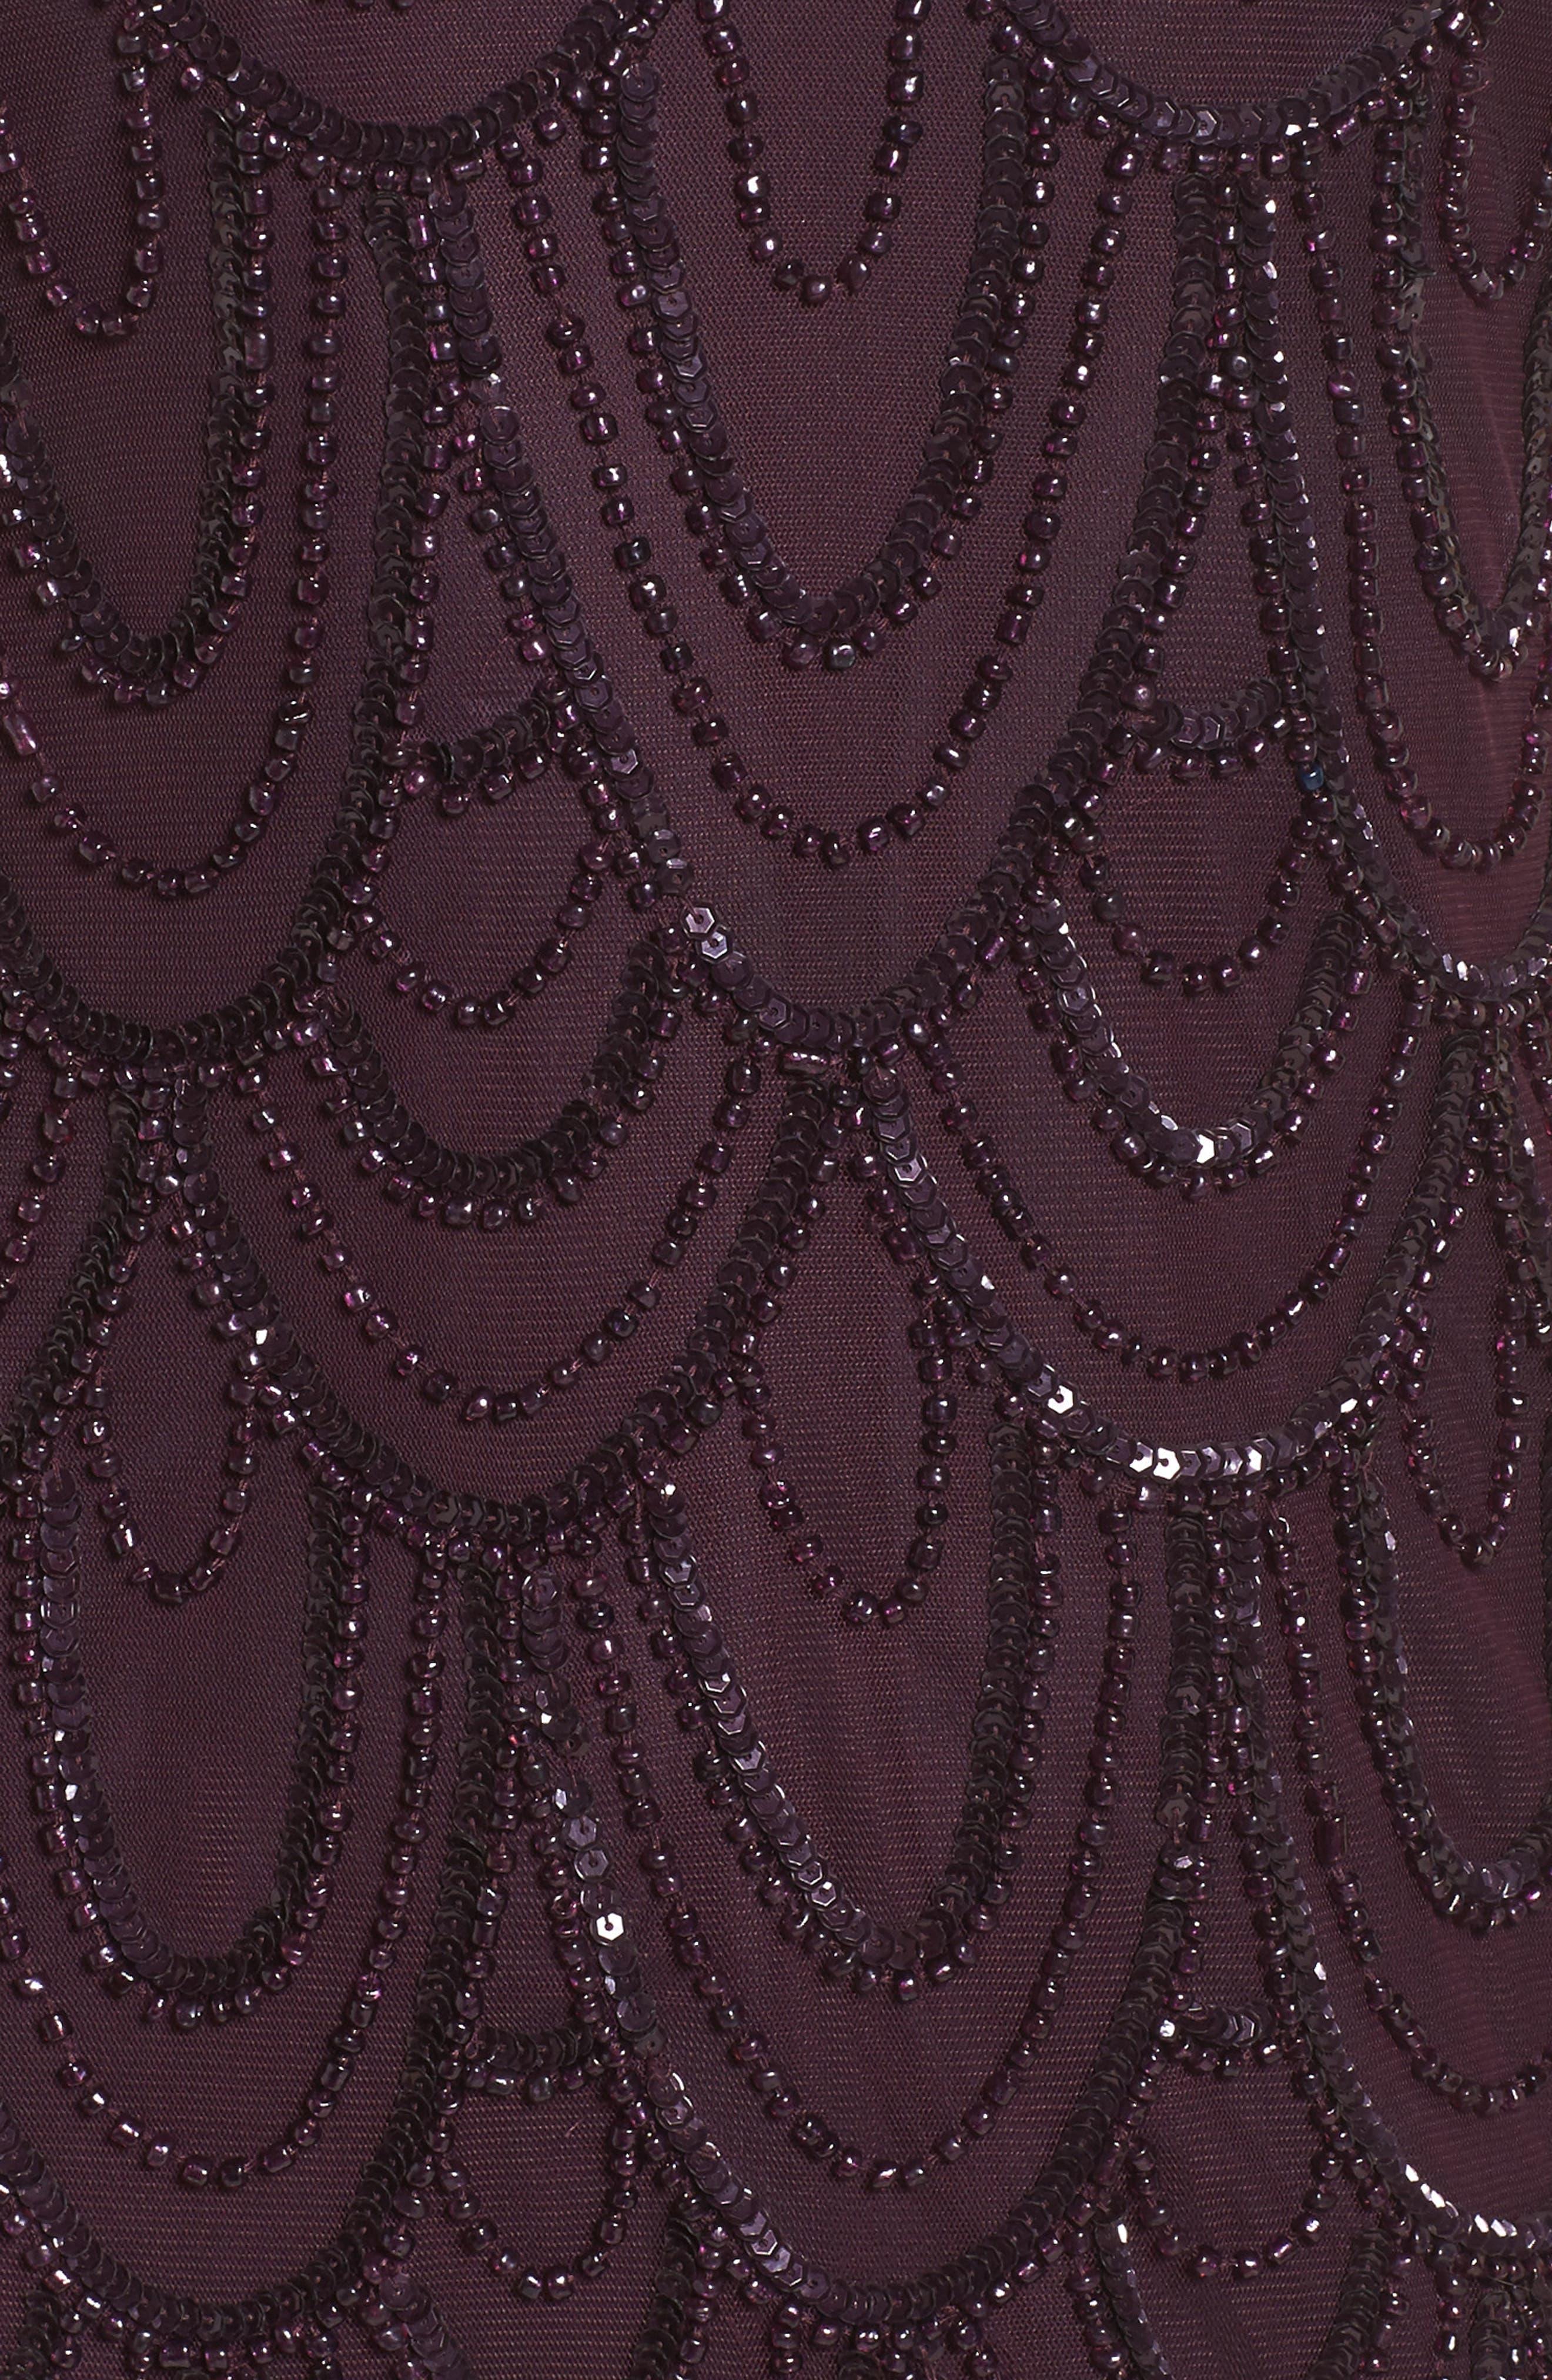 Embellished Mesh Sheath Dress,                             Alternate thumbnail 82, color,